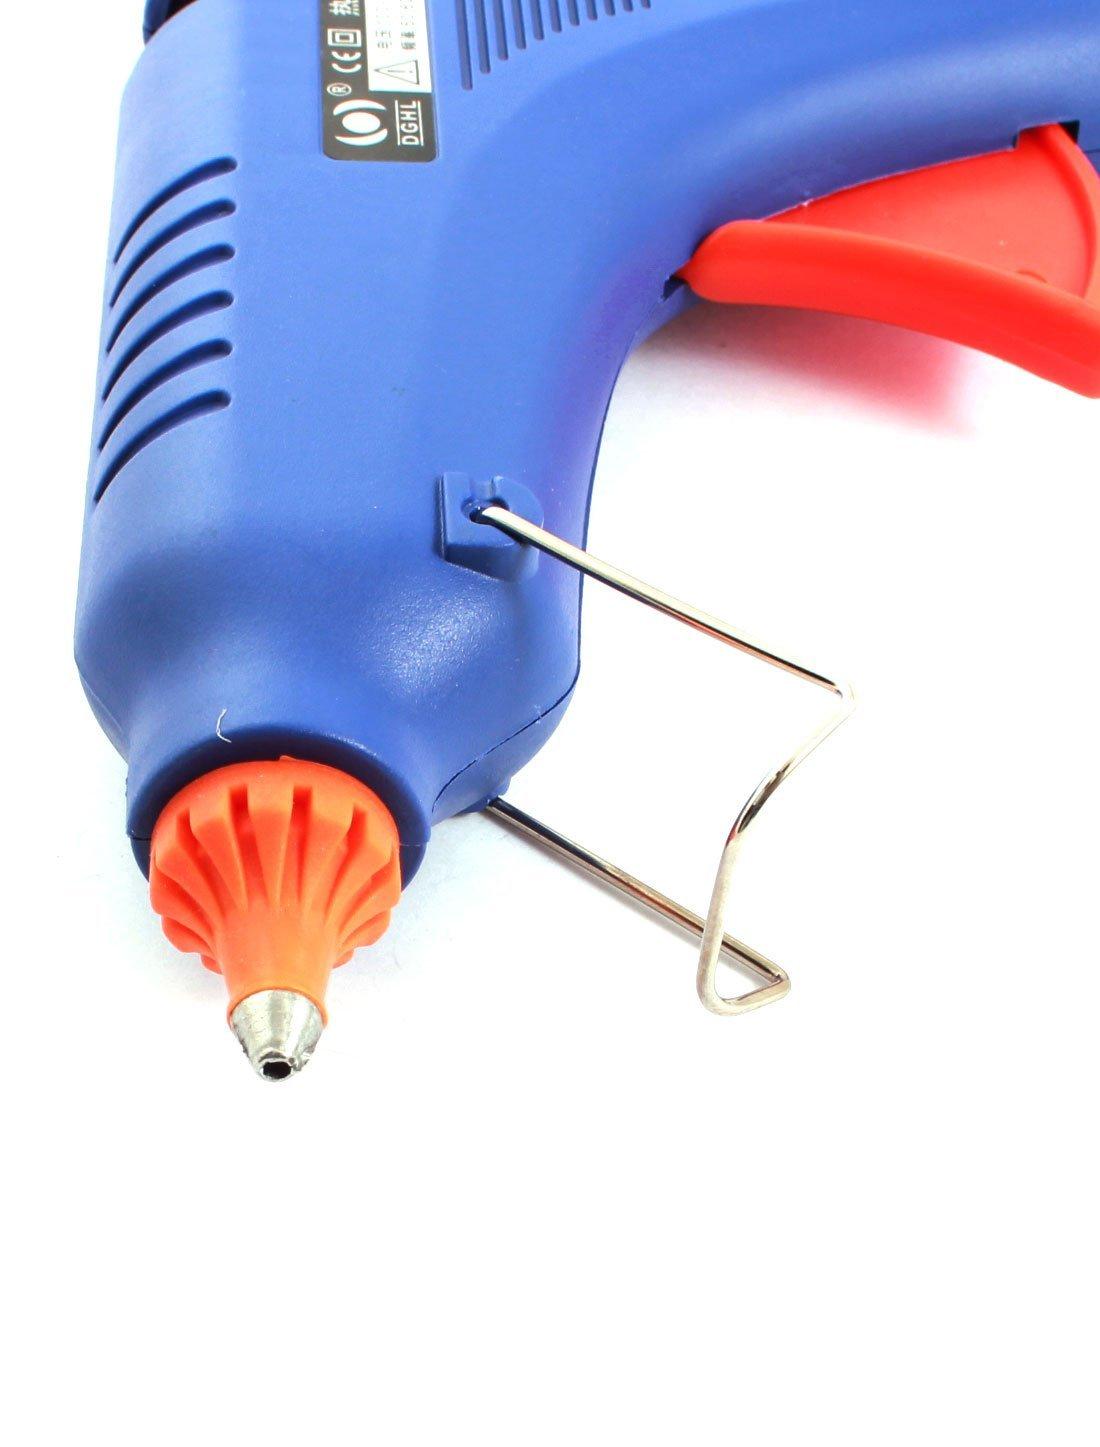 100-240V US Plug 60W Bleu Hot Melt Glue Gun Kit w 10xAdhesive Sticks by eDealMax (Image #2)